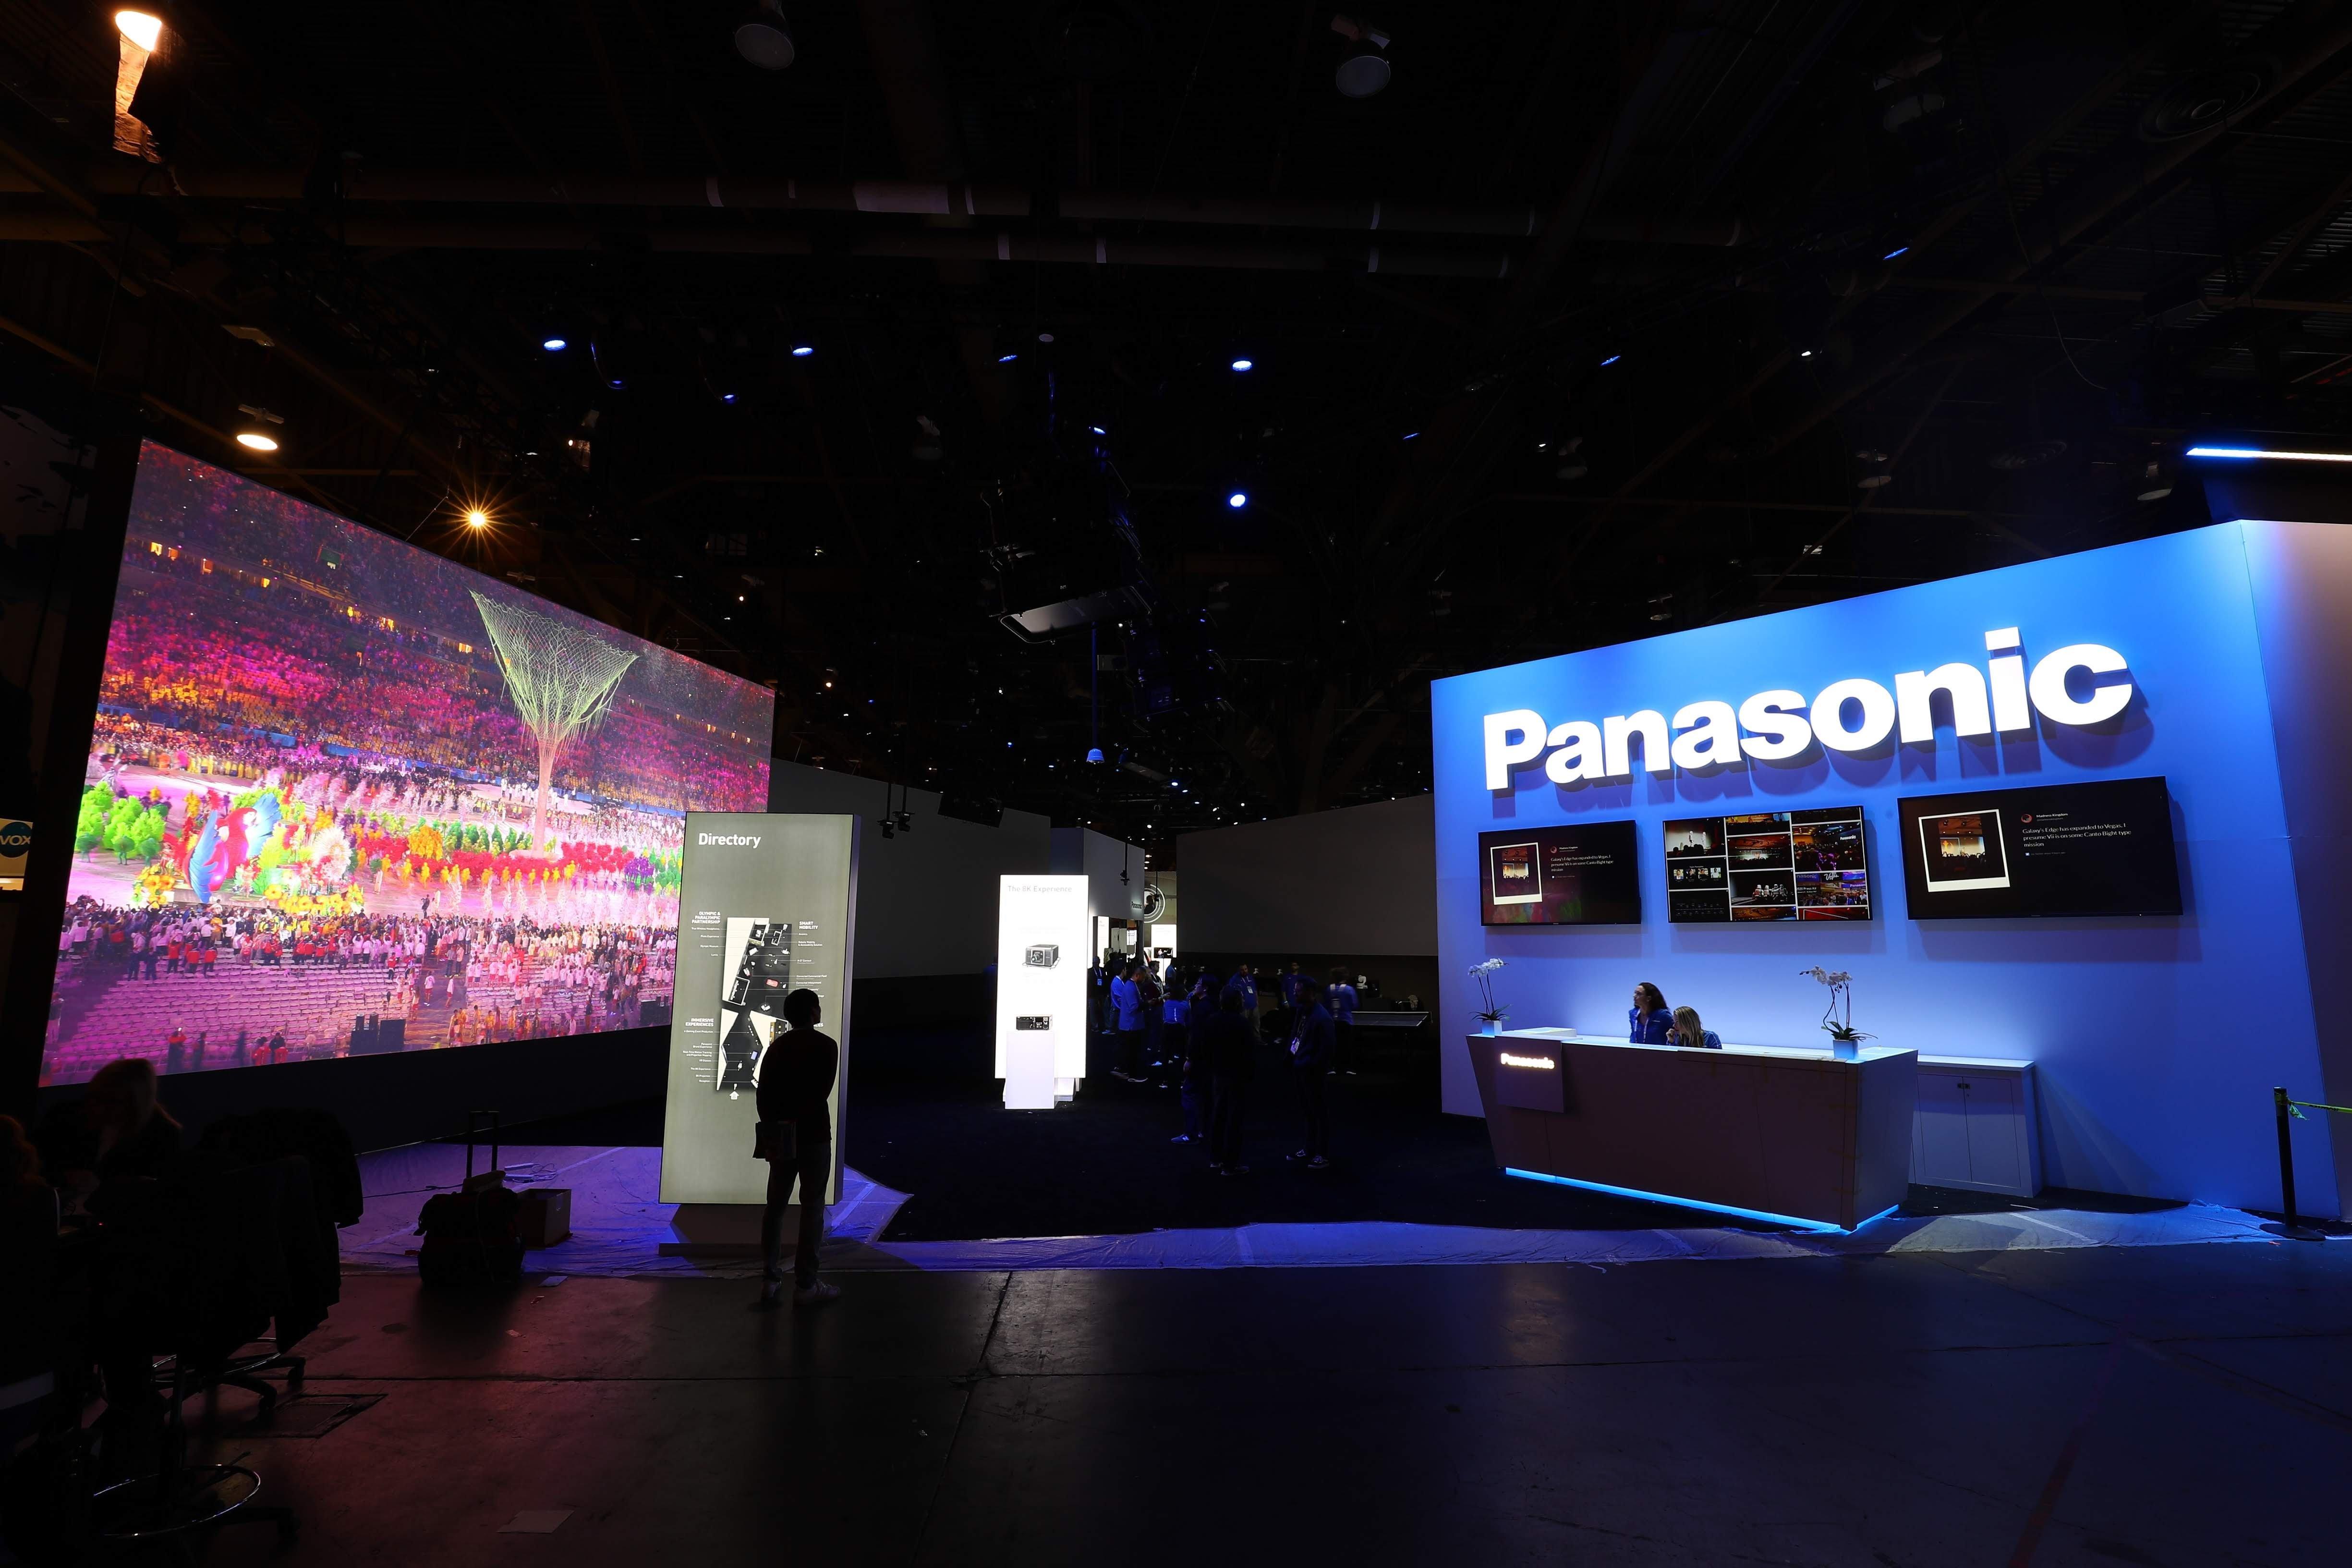 Photo: CES2020 Panasonic Booth